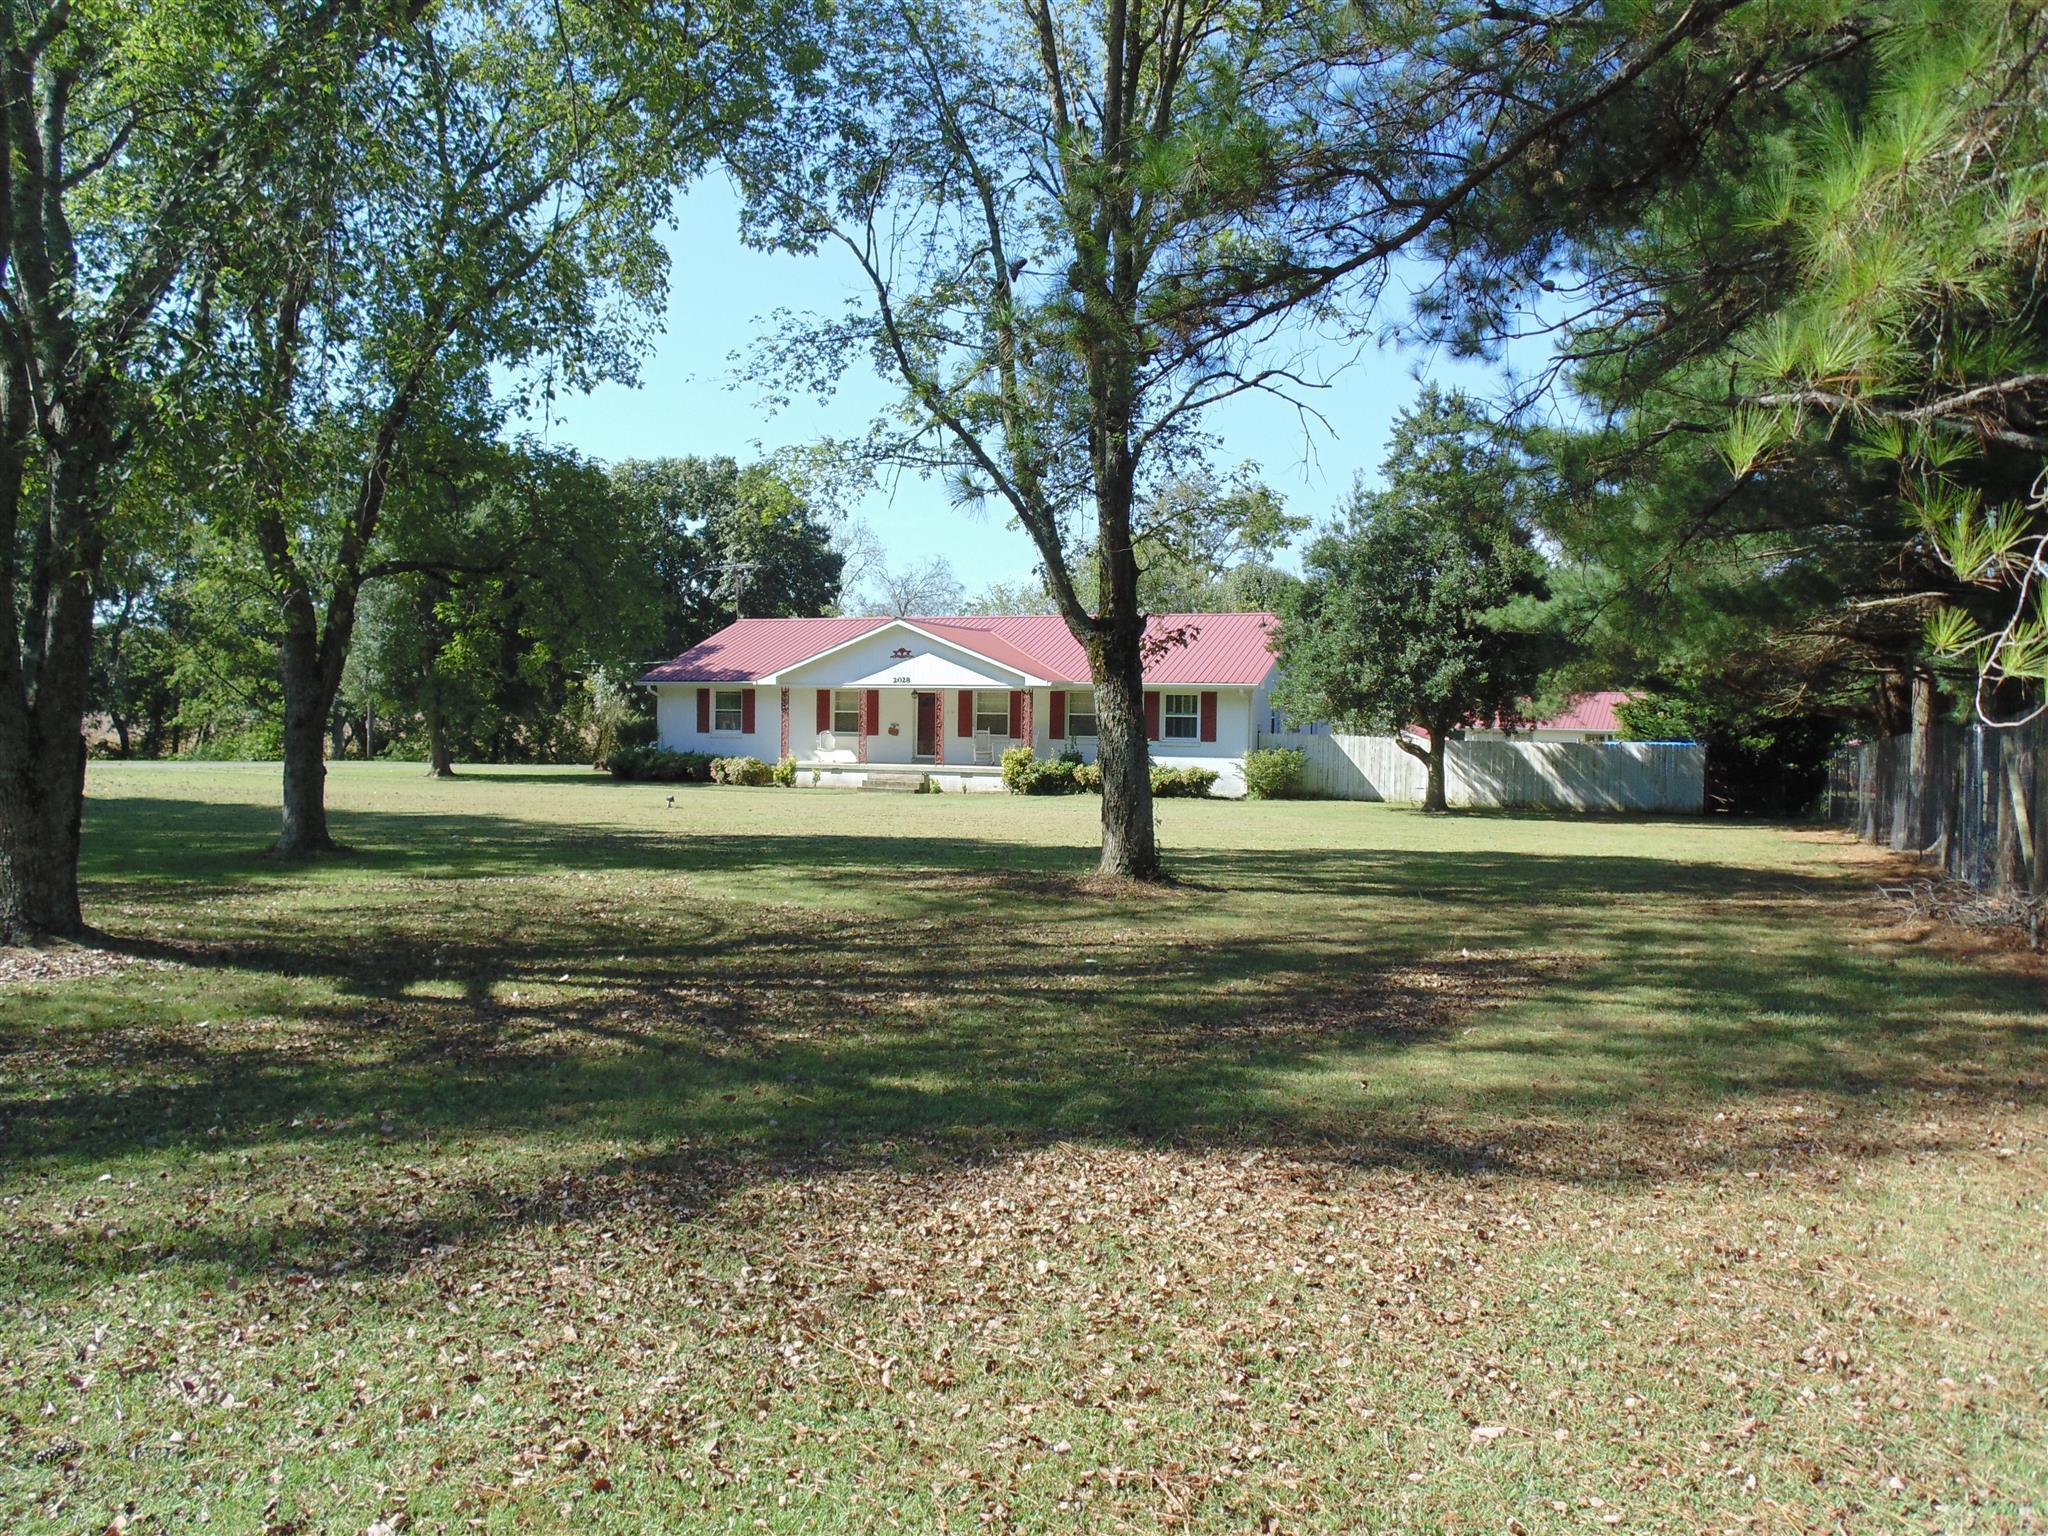 2028 Hwy 82 S, Shelbyville, TN 37160 - Shelbyville, TN real estate listing